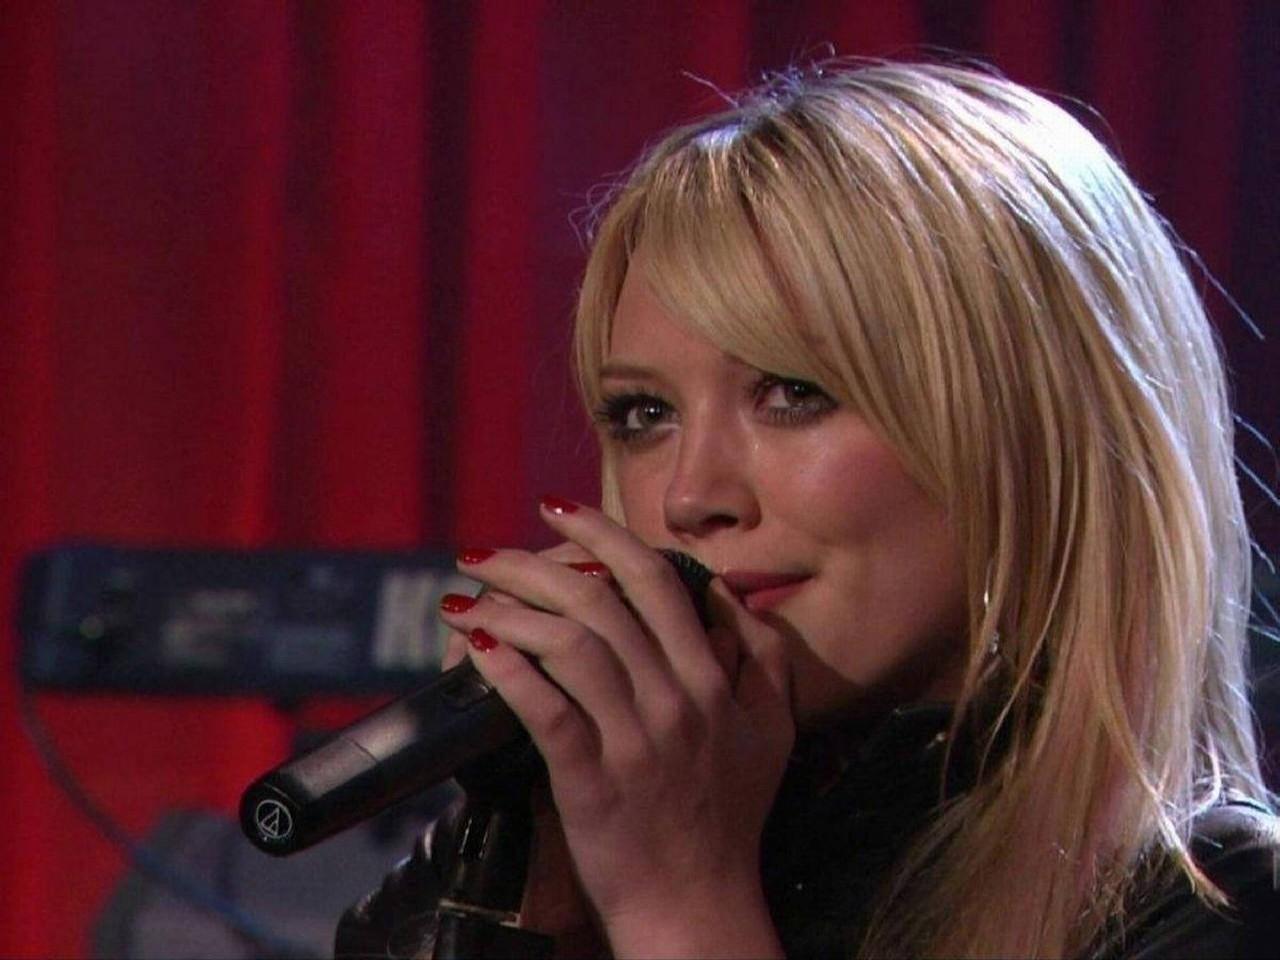 Wallpaper di Hilary Duff - 23